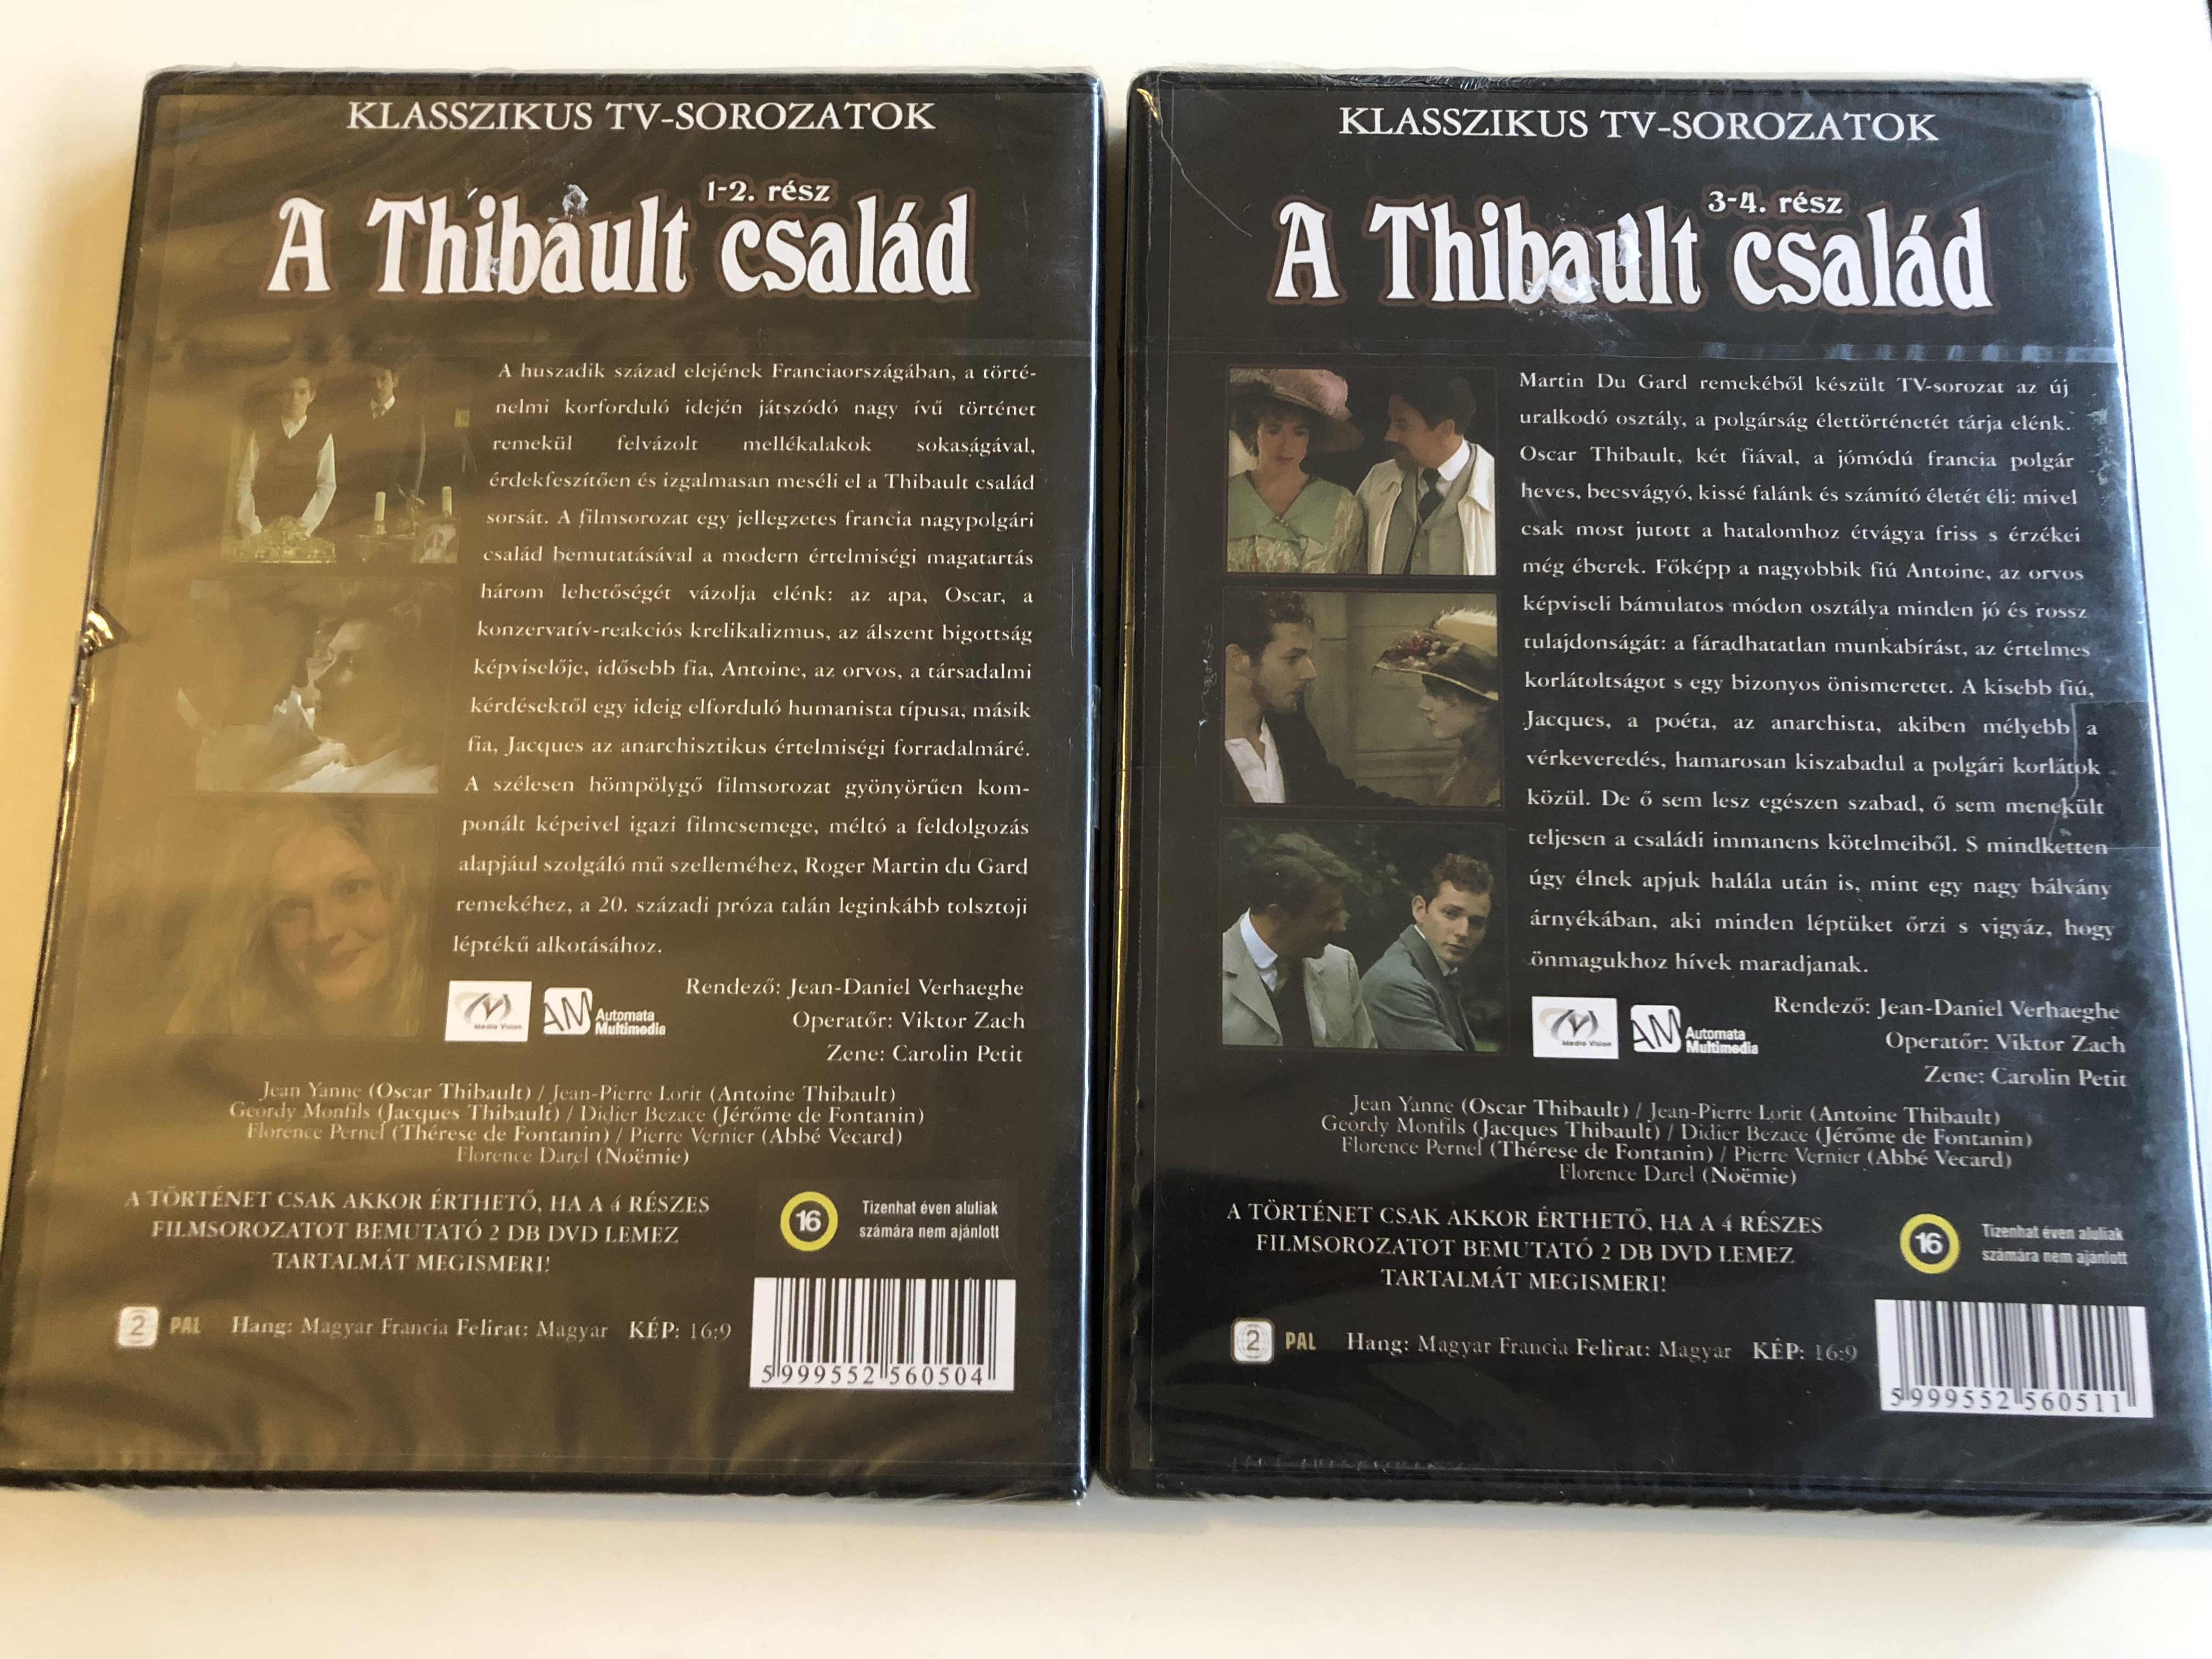 -les-thibault-dvd-2003-a-thibault-csal-d-directed-by-jean-daniel-verhaeghe-starring-jean-yanne-jean-pierre-lorit-geordy-monfil-didier-bezace-french-tv-miniseries-516752007-.jpg